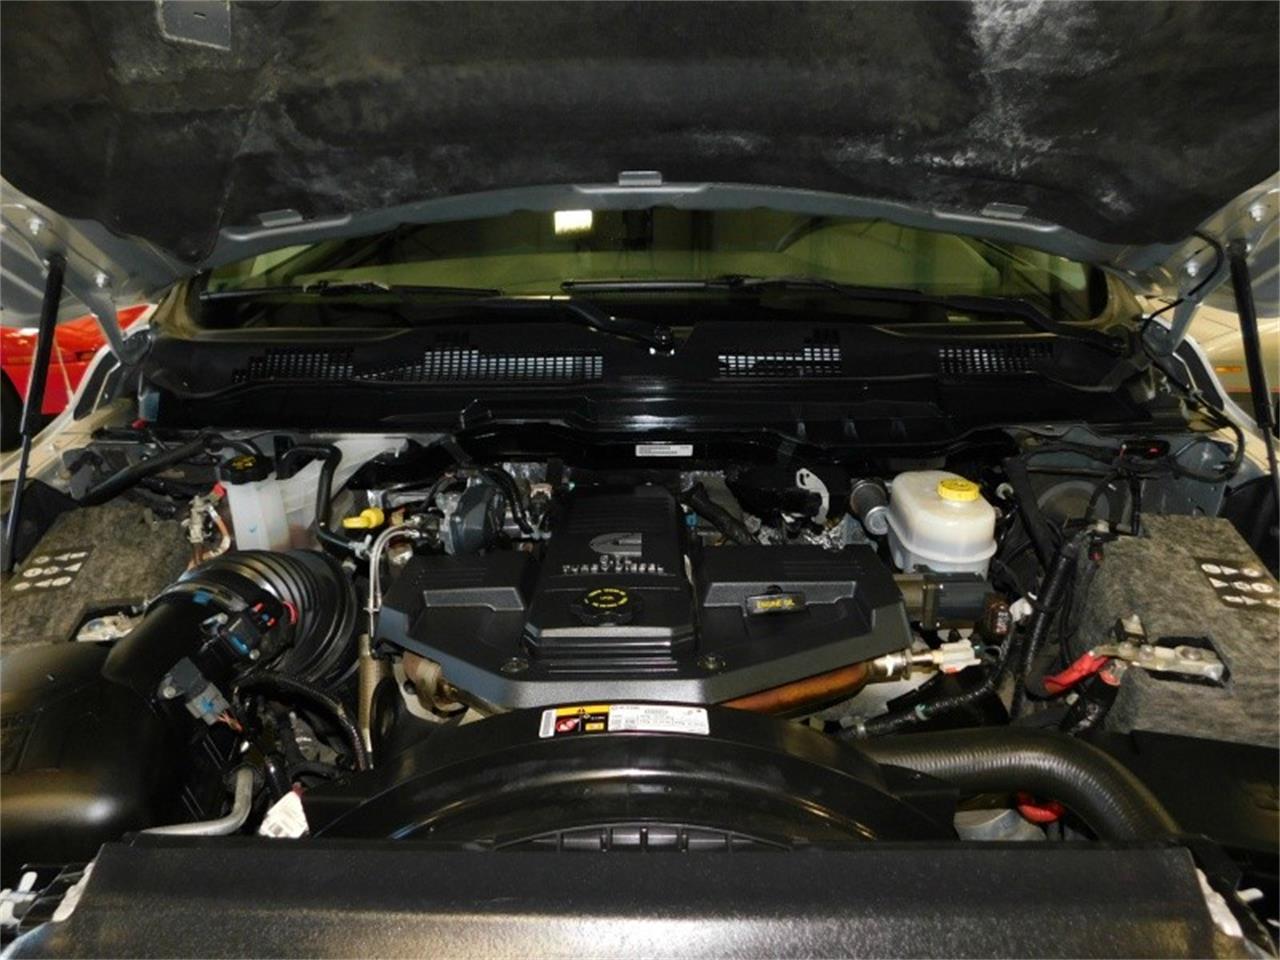 2015 Dodge Ram 2500 (CC-1253457) for sale in Bend, Oregon